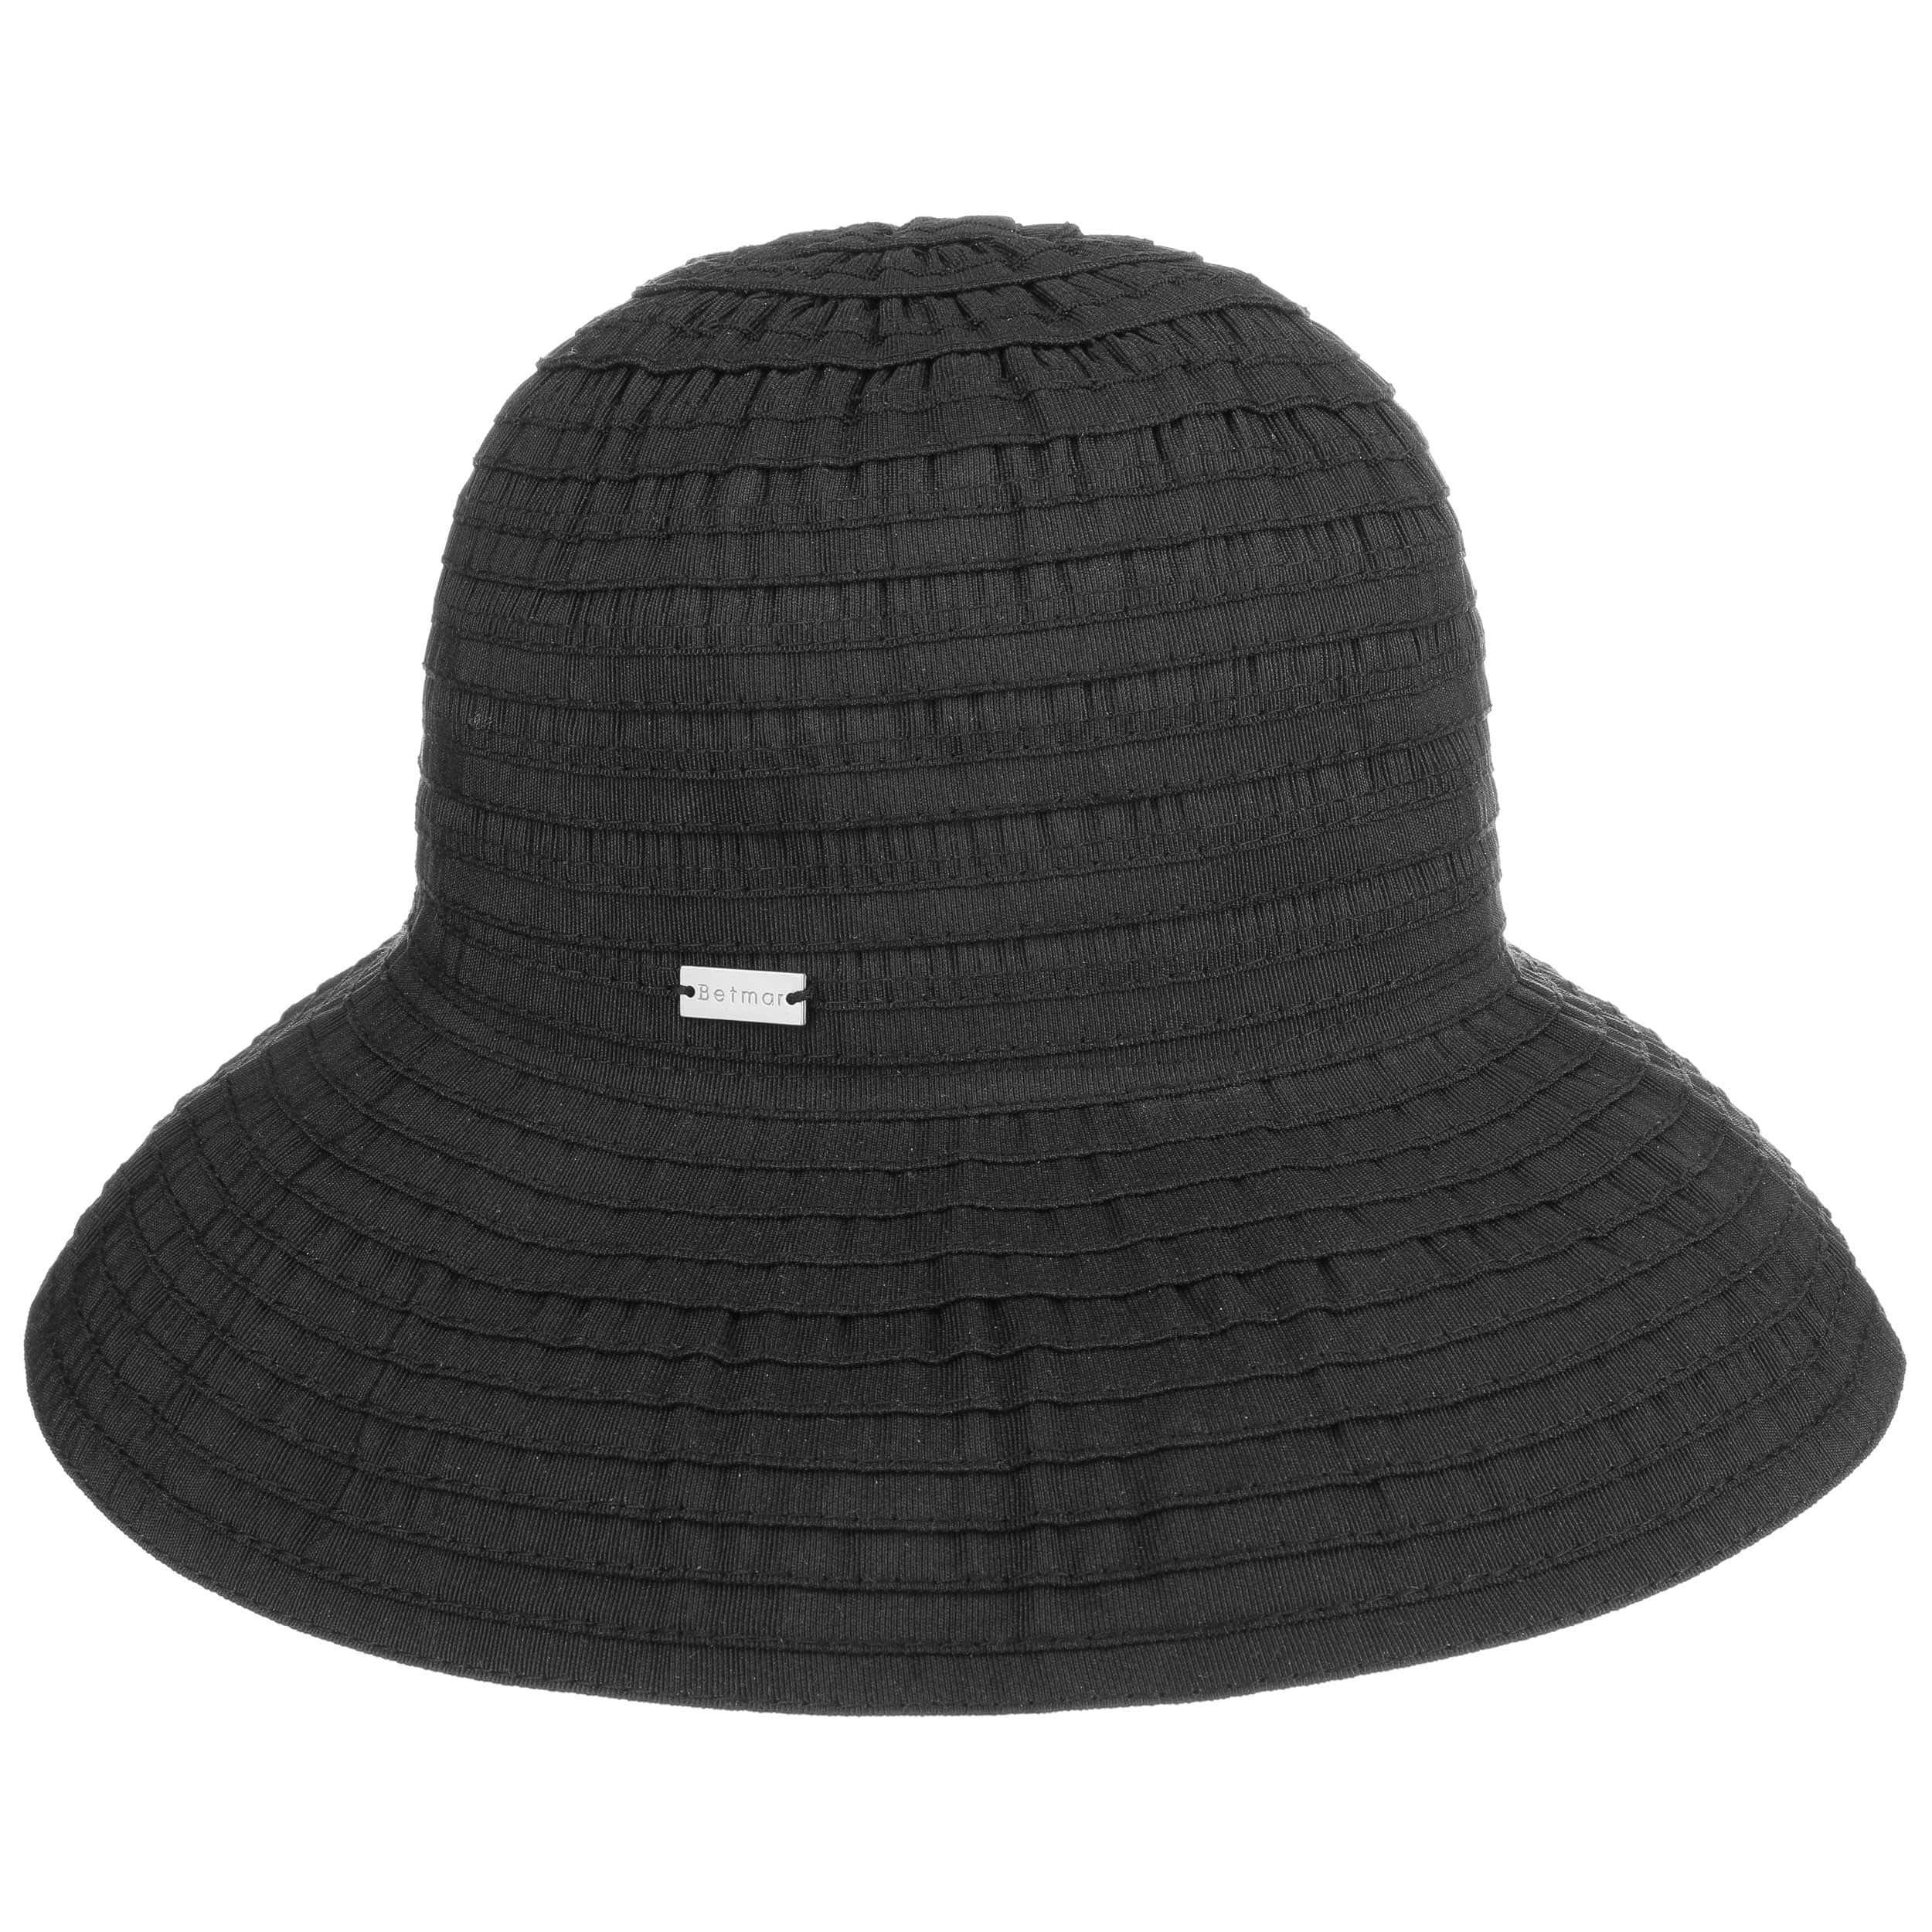 213f5ac9583 ... Classic Sunshade Hut by Betmar - weiß 7. 34 ...